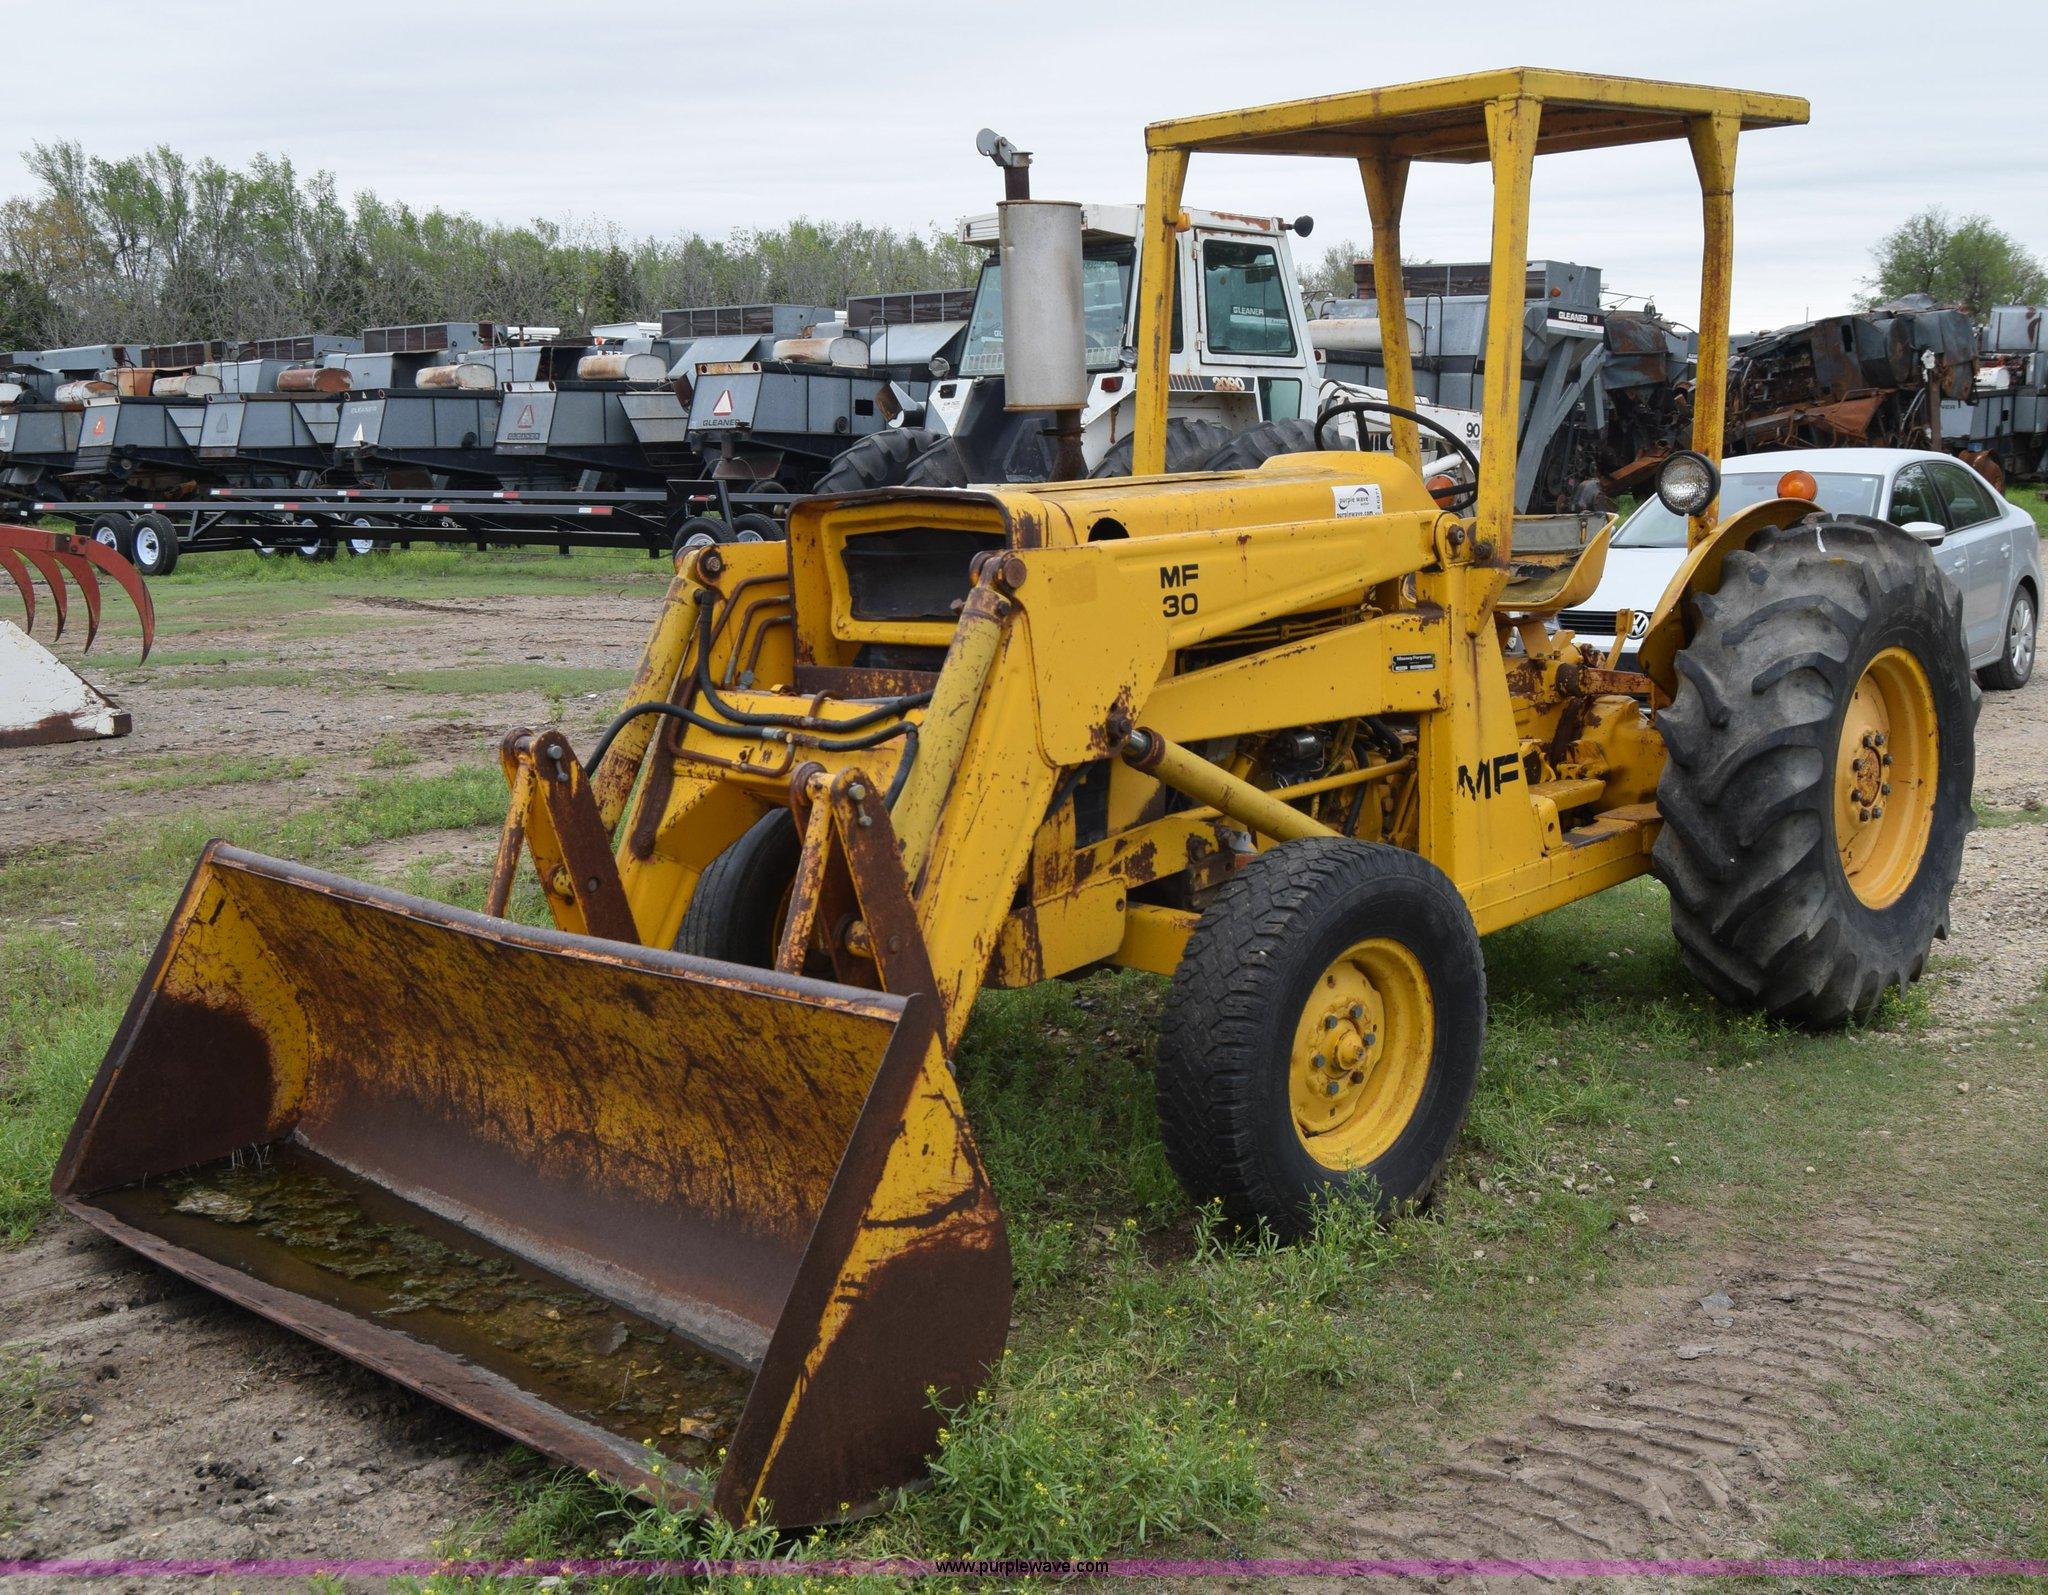 Massey Ferguson Mf30 Tractor In Buhler Ks Item E6371 Sold Purple Wave